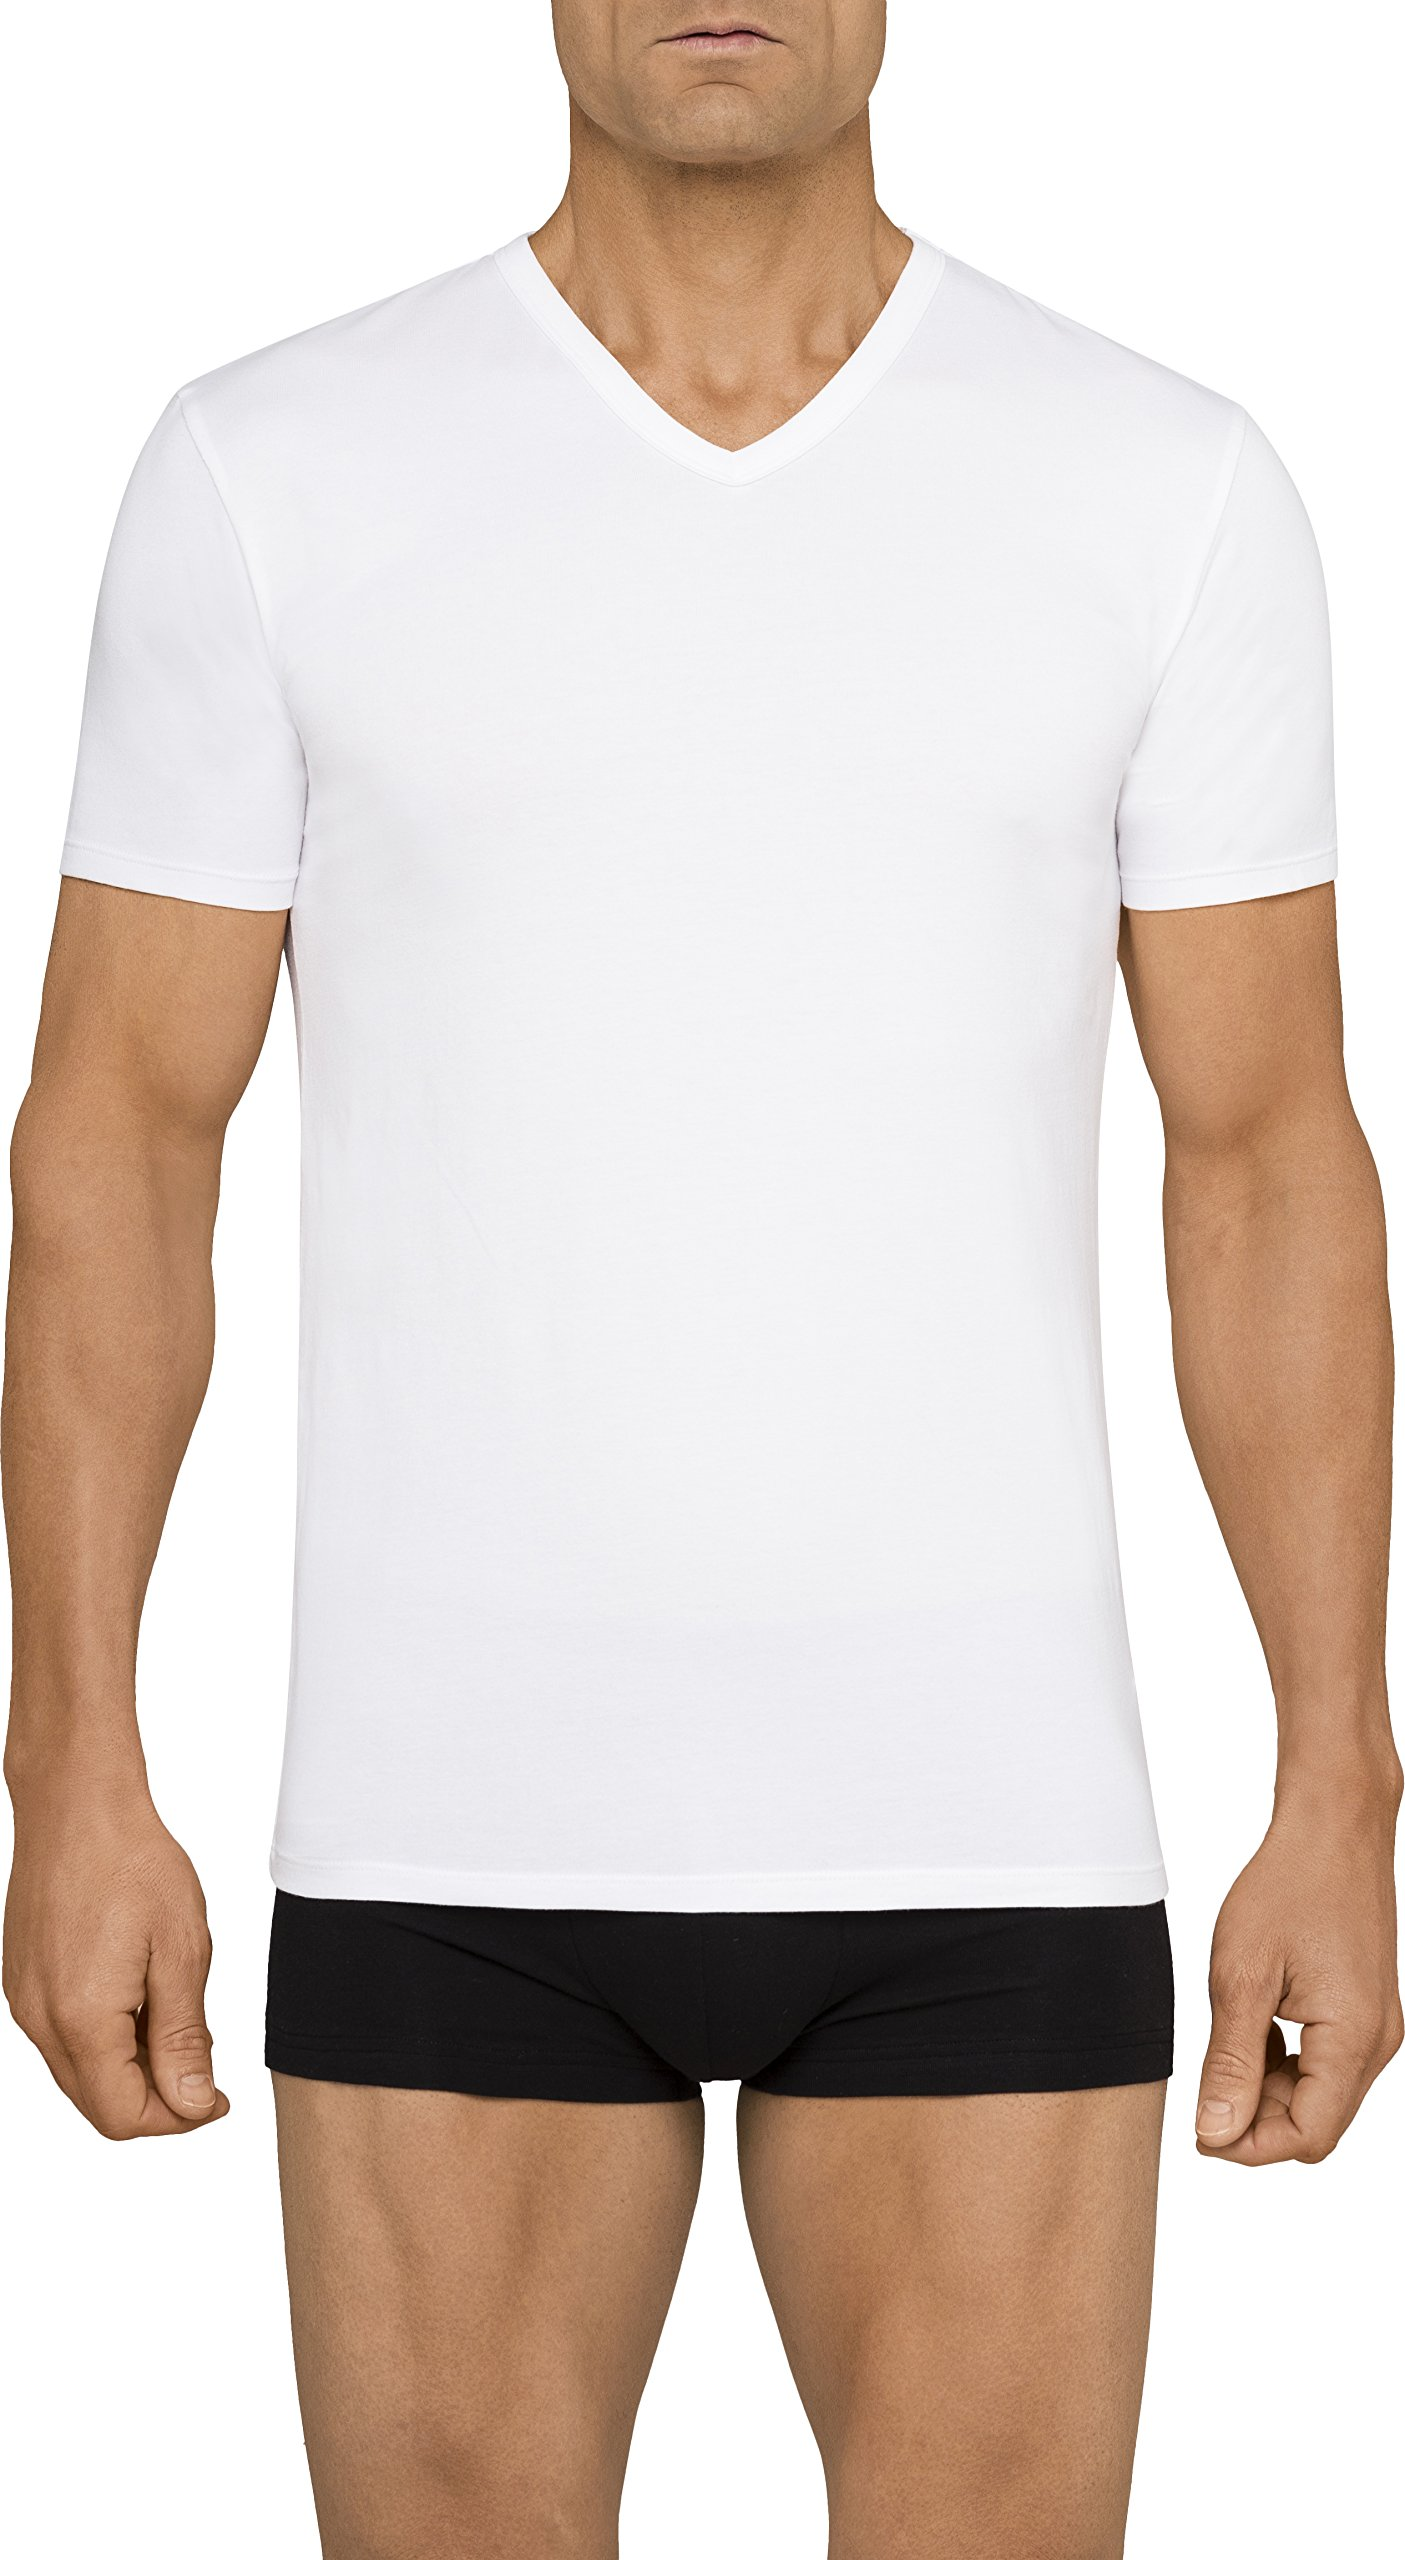 Calvin Klein Men's Undershirts Cotton Stretch 2 Pack V Neck Tshirts, White, Medium